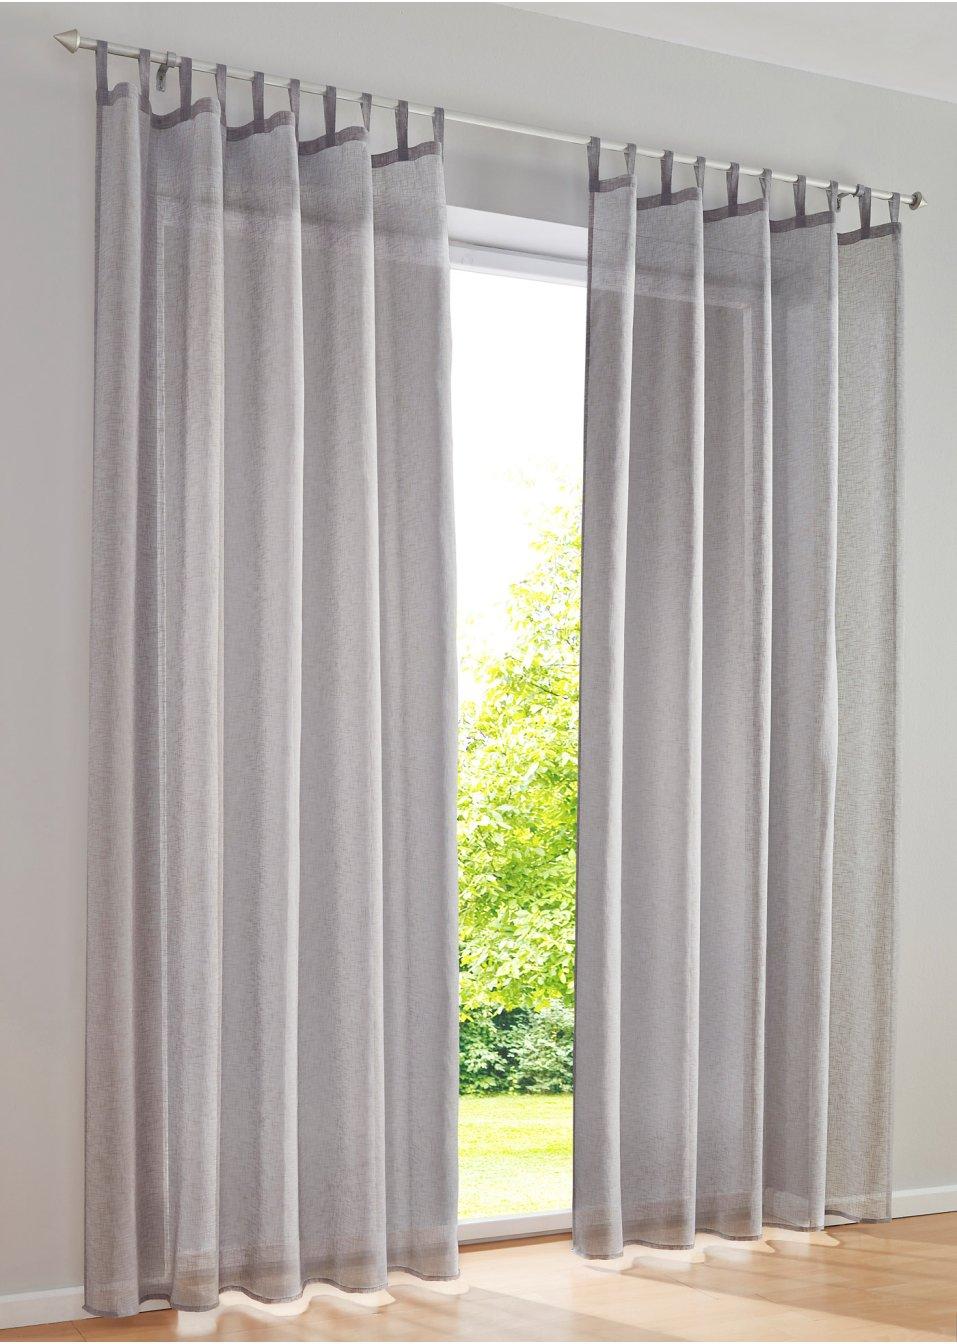 gardine gabby 1er pack grau bpc living online. Black Bedroom Furniture Sets. Home Design Ideas